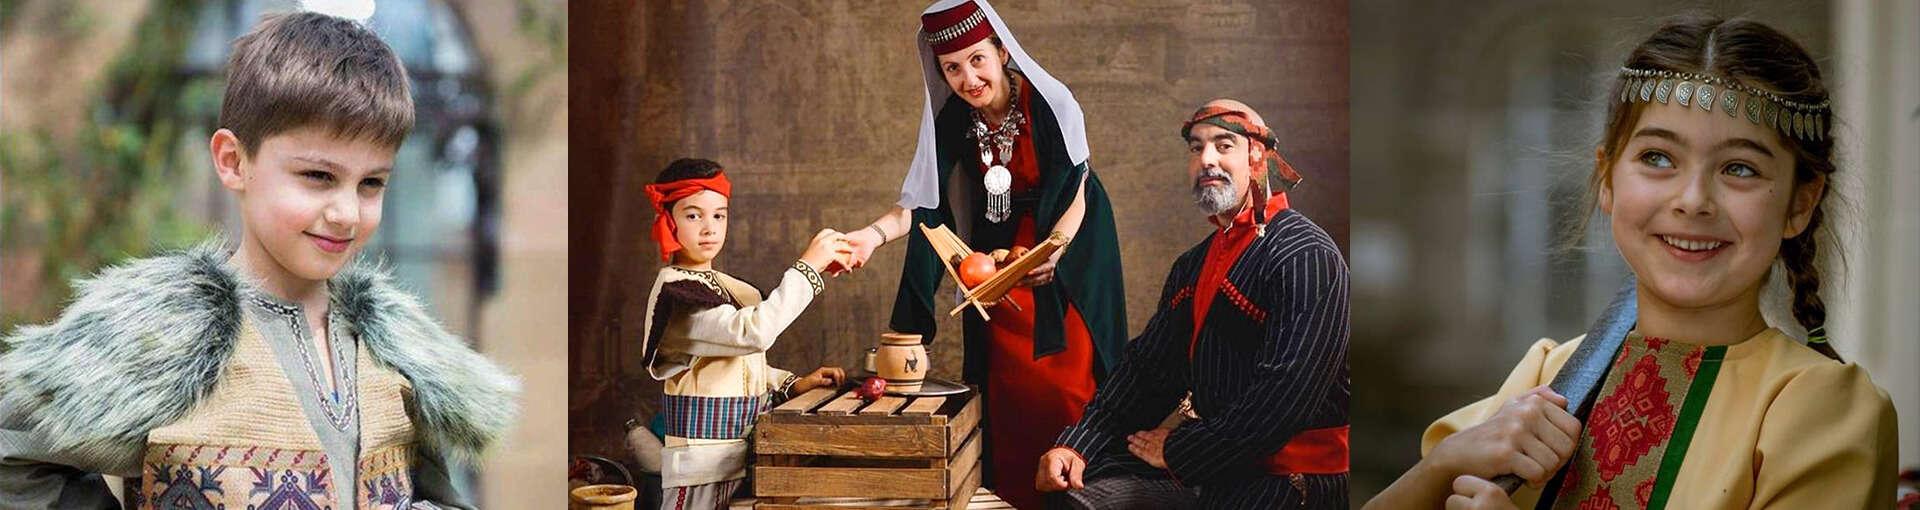 The Armenian Ethnicity